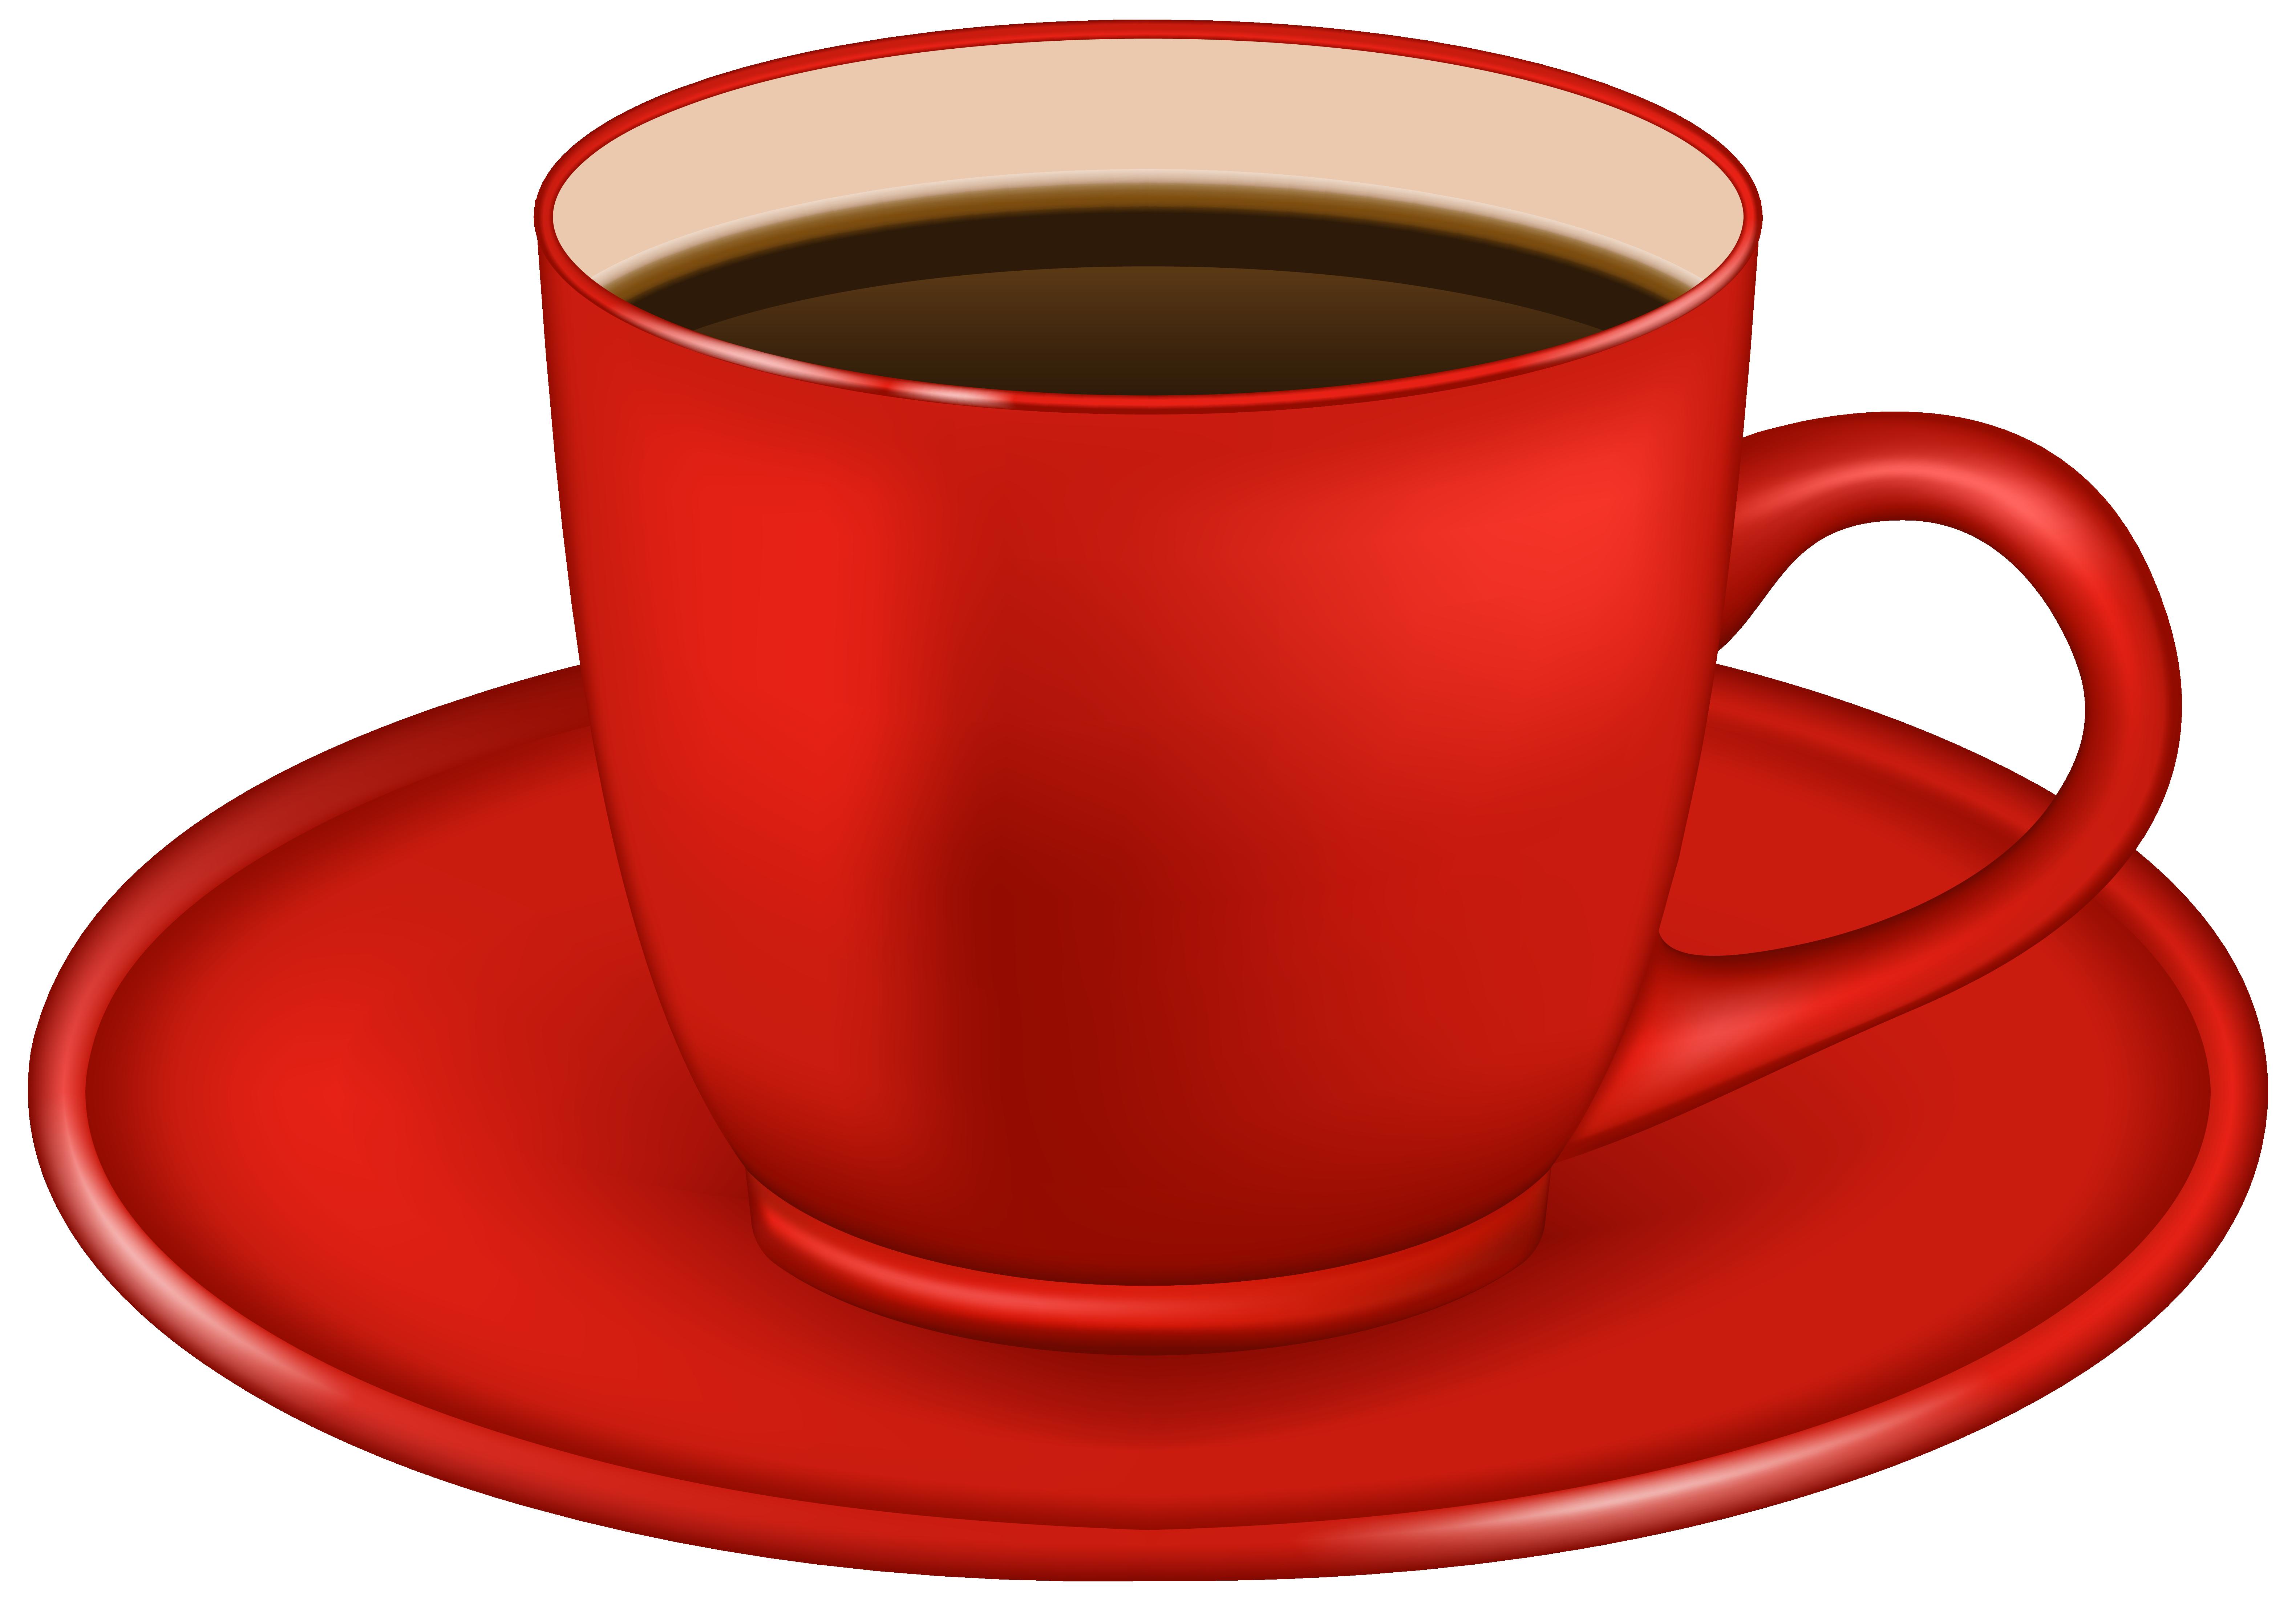 Cute Coffee Mugs Cup Clipart Best